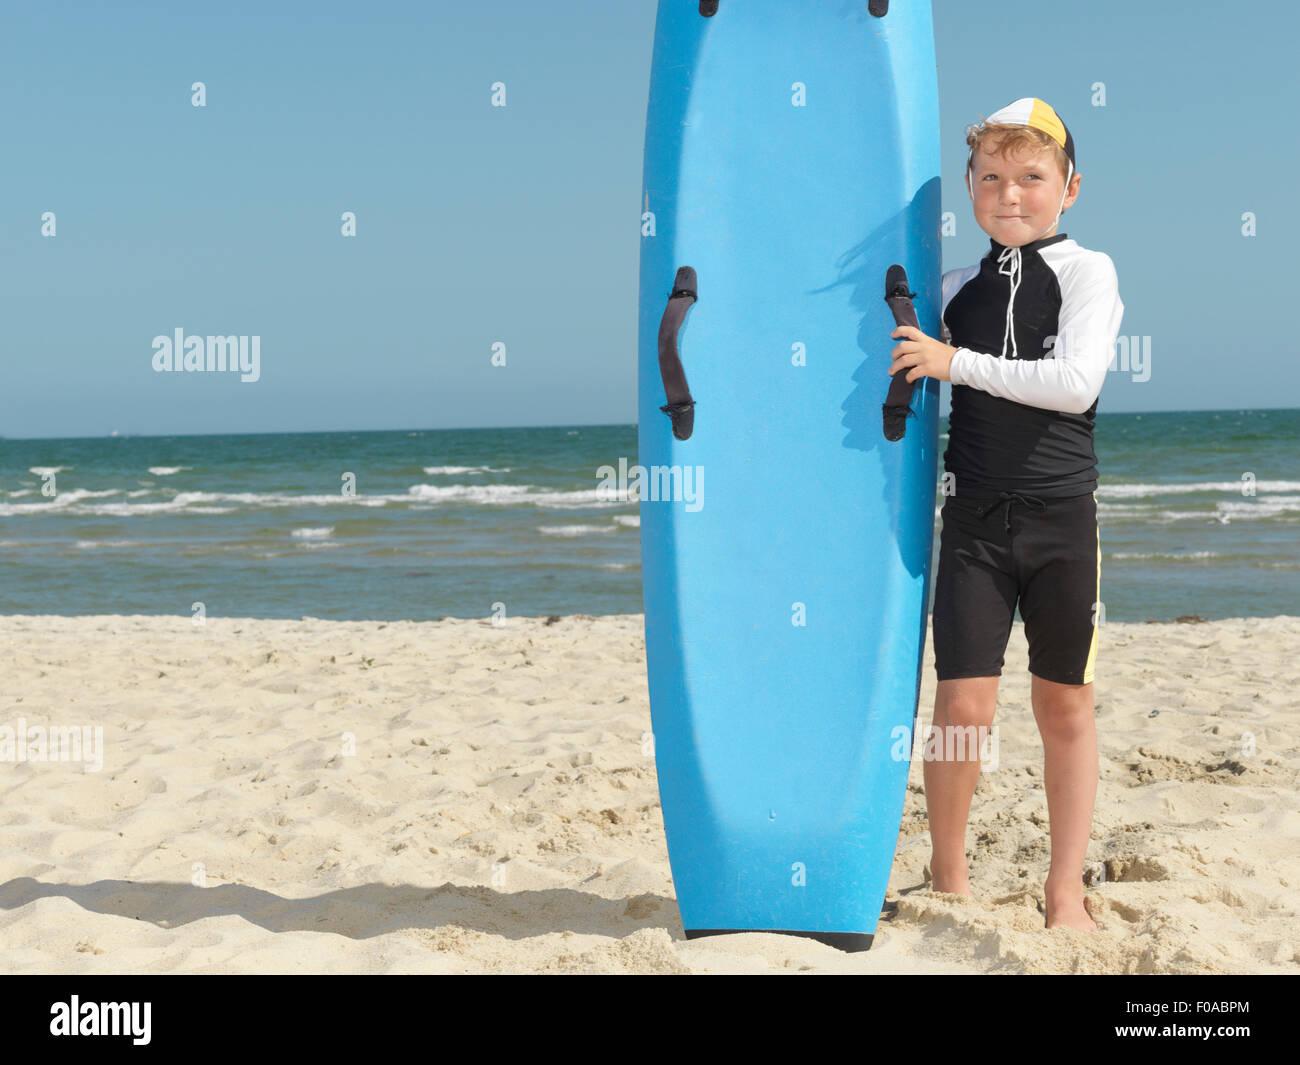 Portrait of boy nipper (child surf life savers) next to surfboard, Altona, Melbourne, Australia - Stock Image